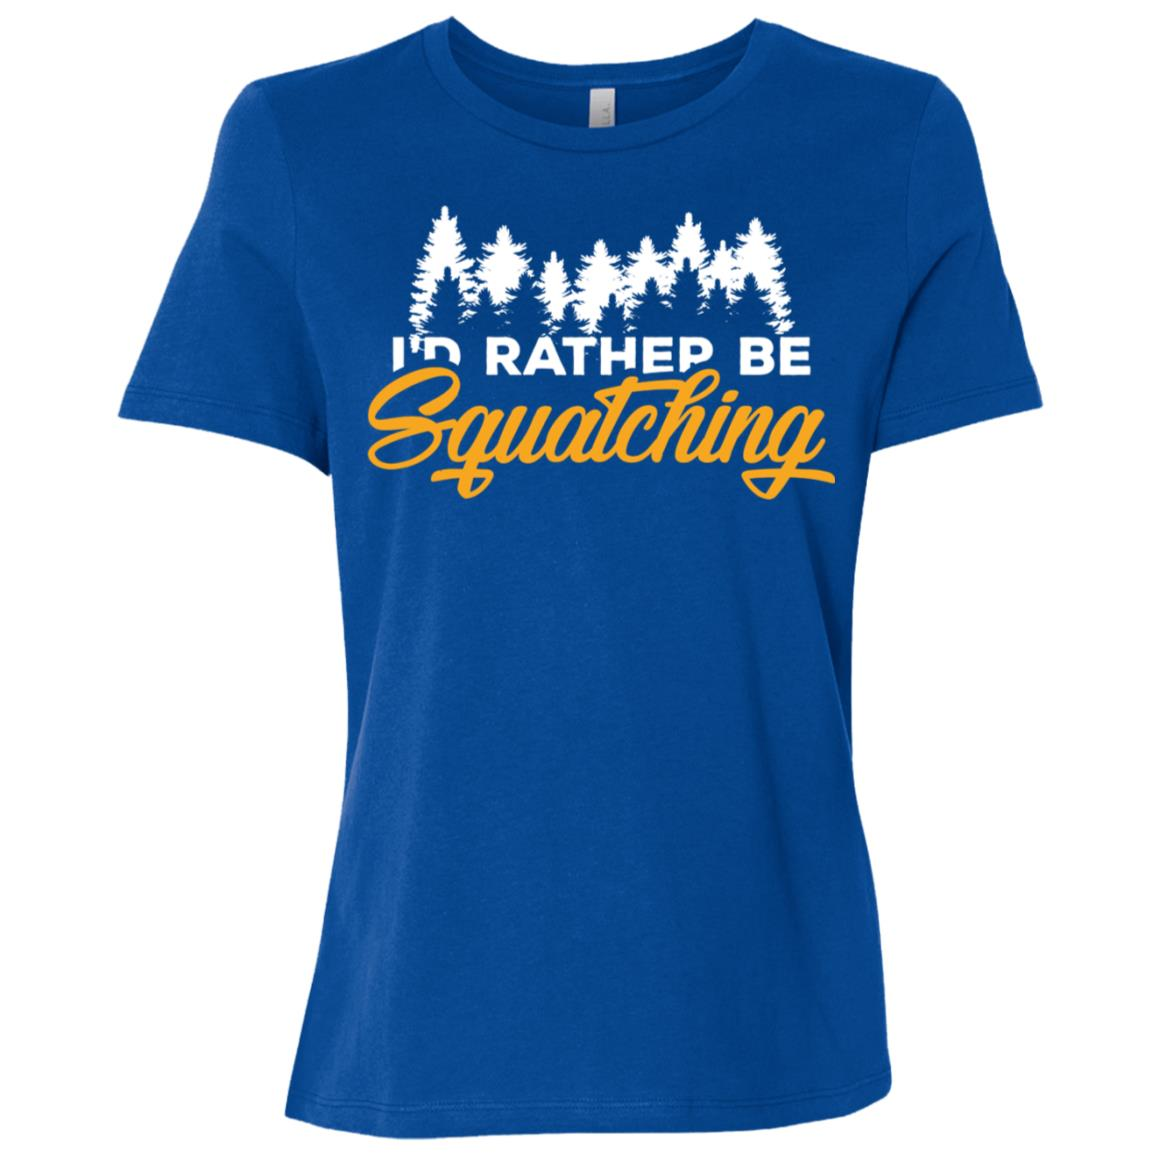 Bigfoot Sasquatch I'd Rather be Squatching Women Short Sleeve T-Shirt